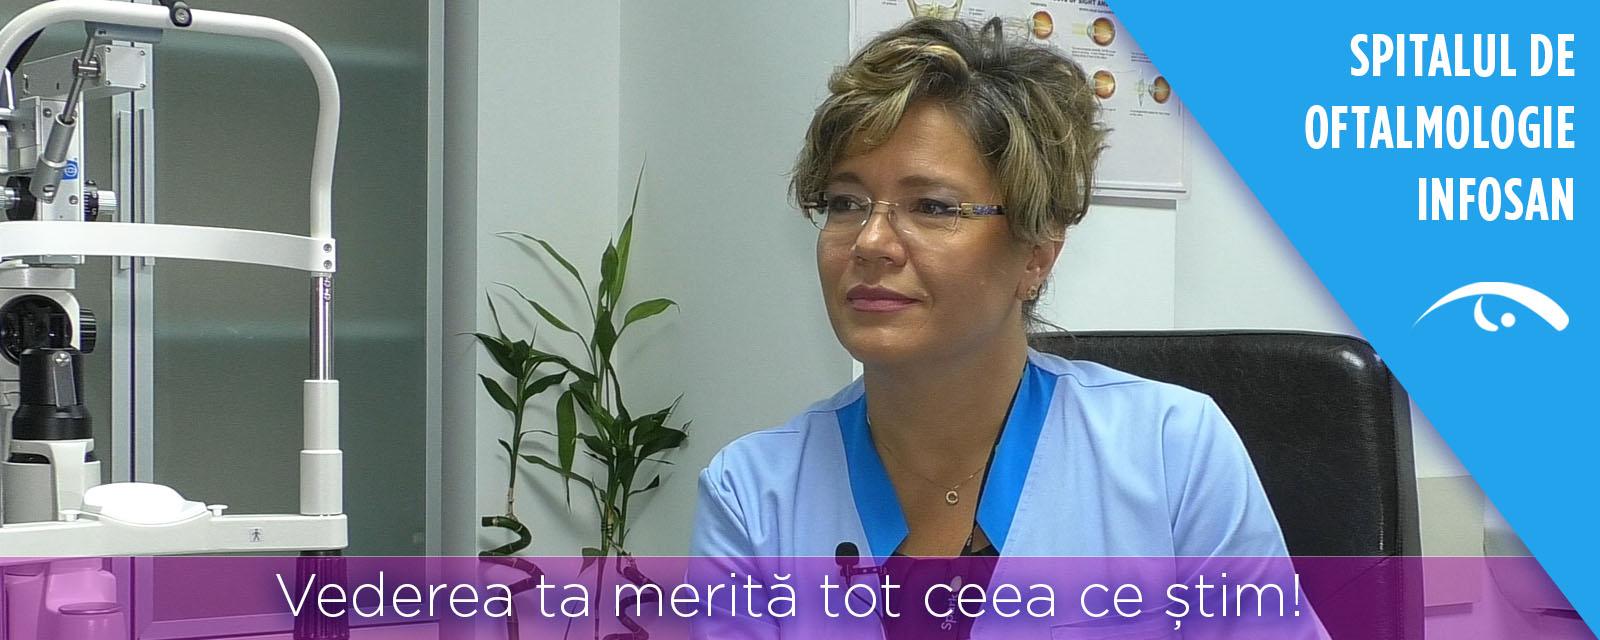 forum despre oftalmologie pediatrică